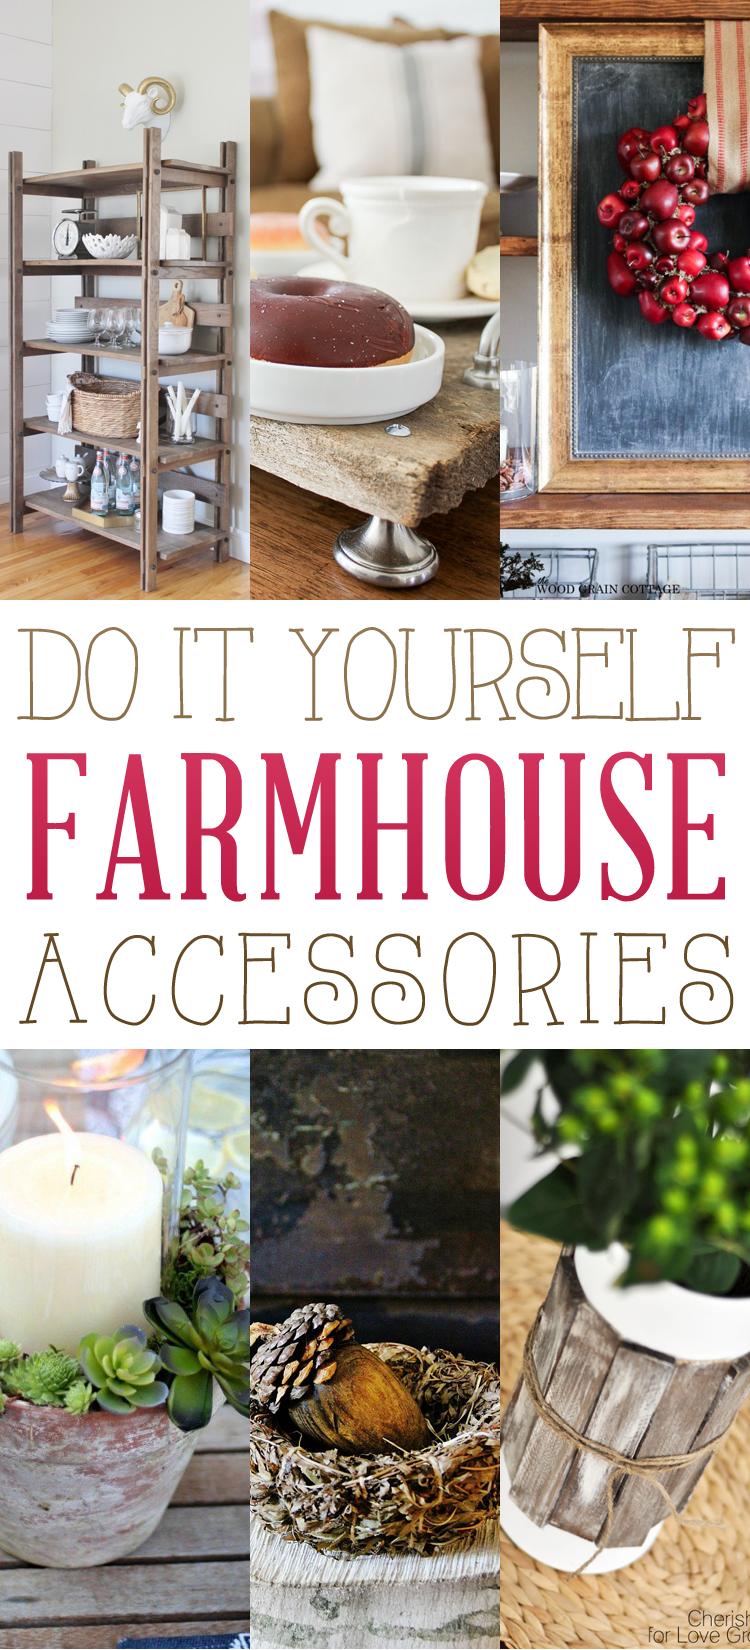 FarmhouseStuff-TOWERRR01